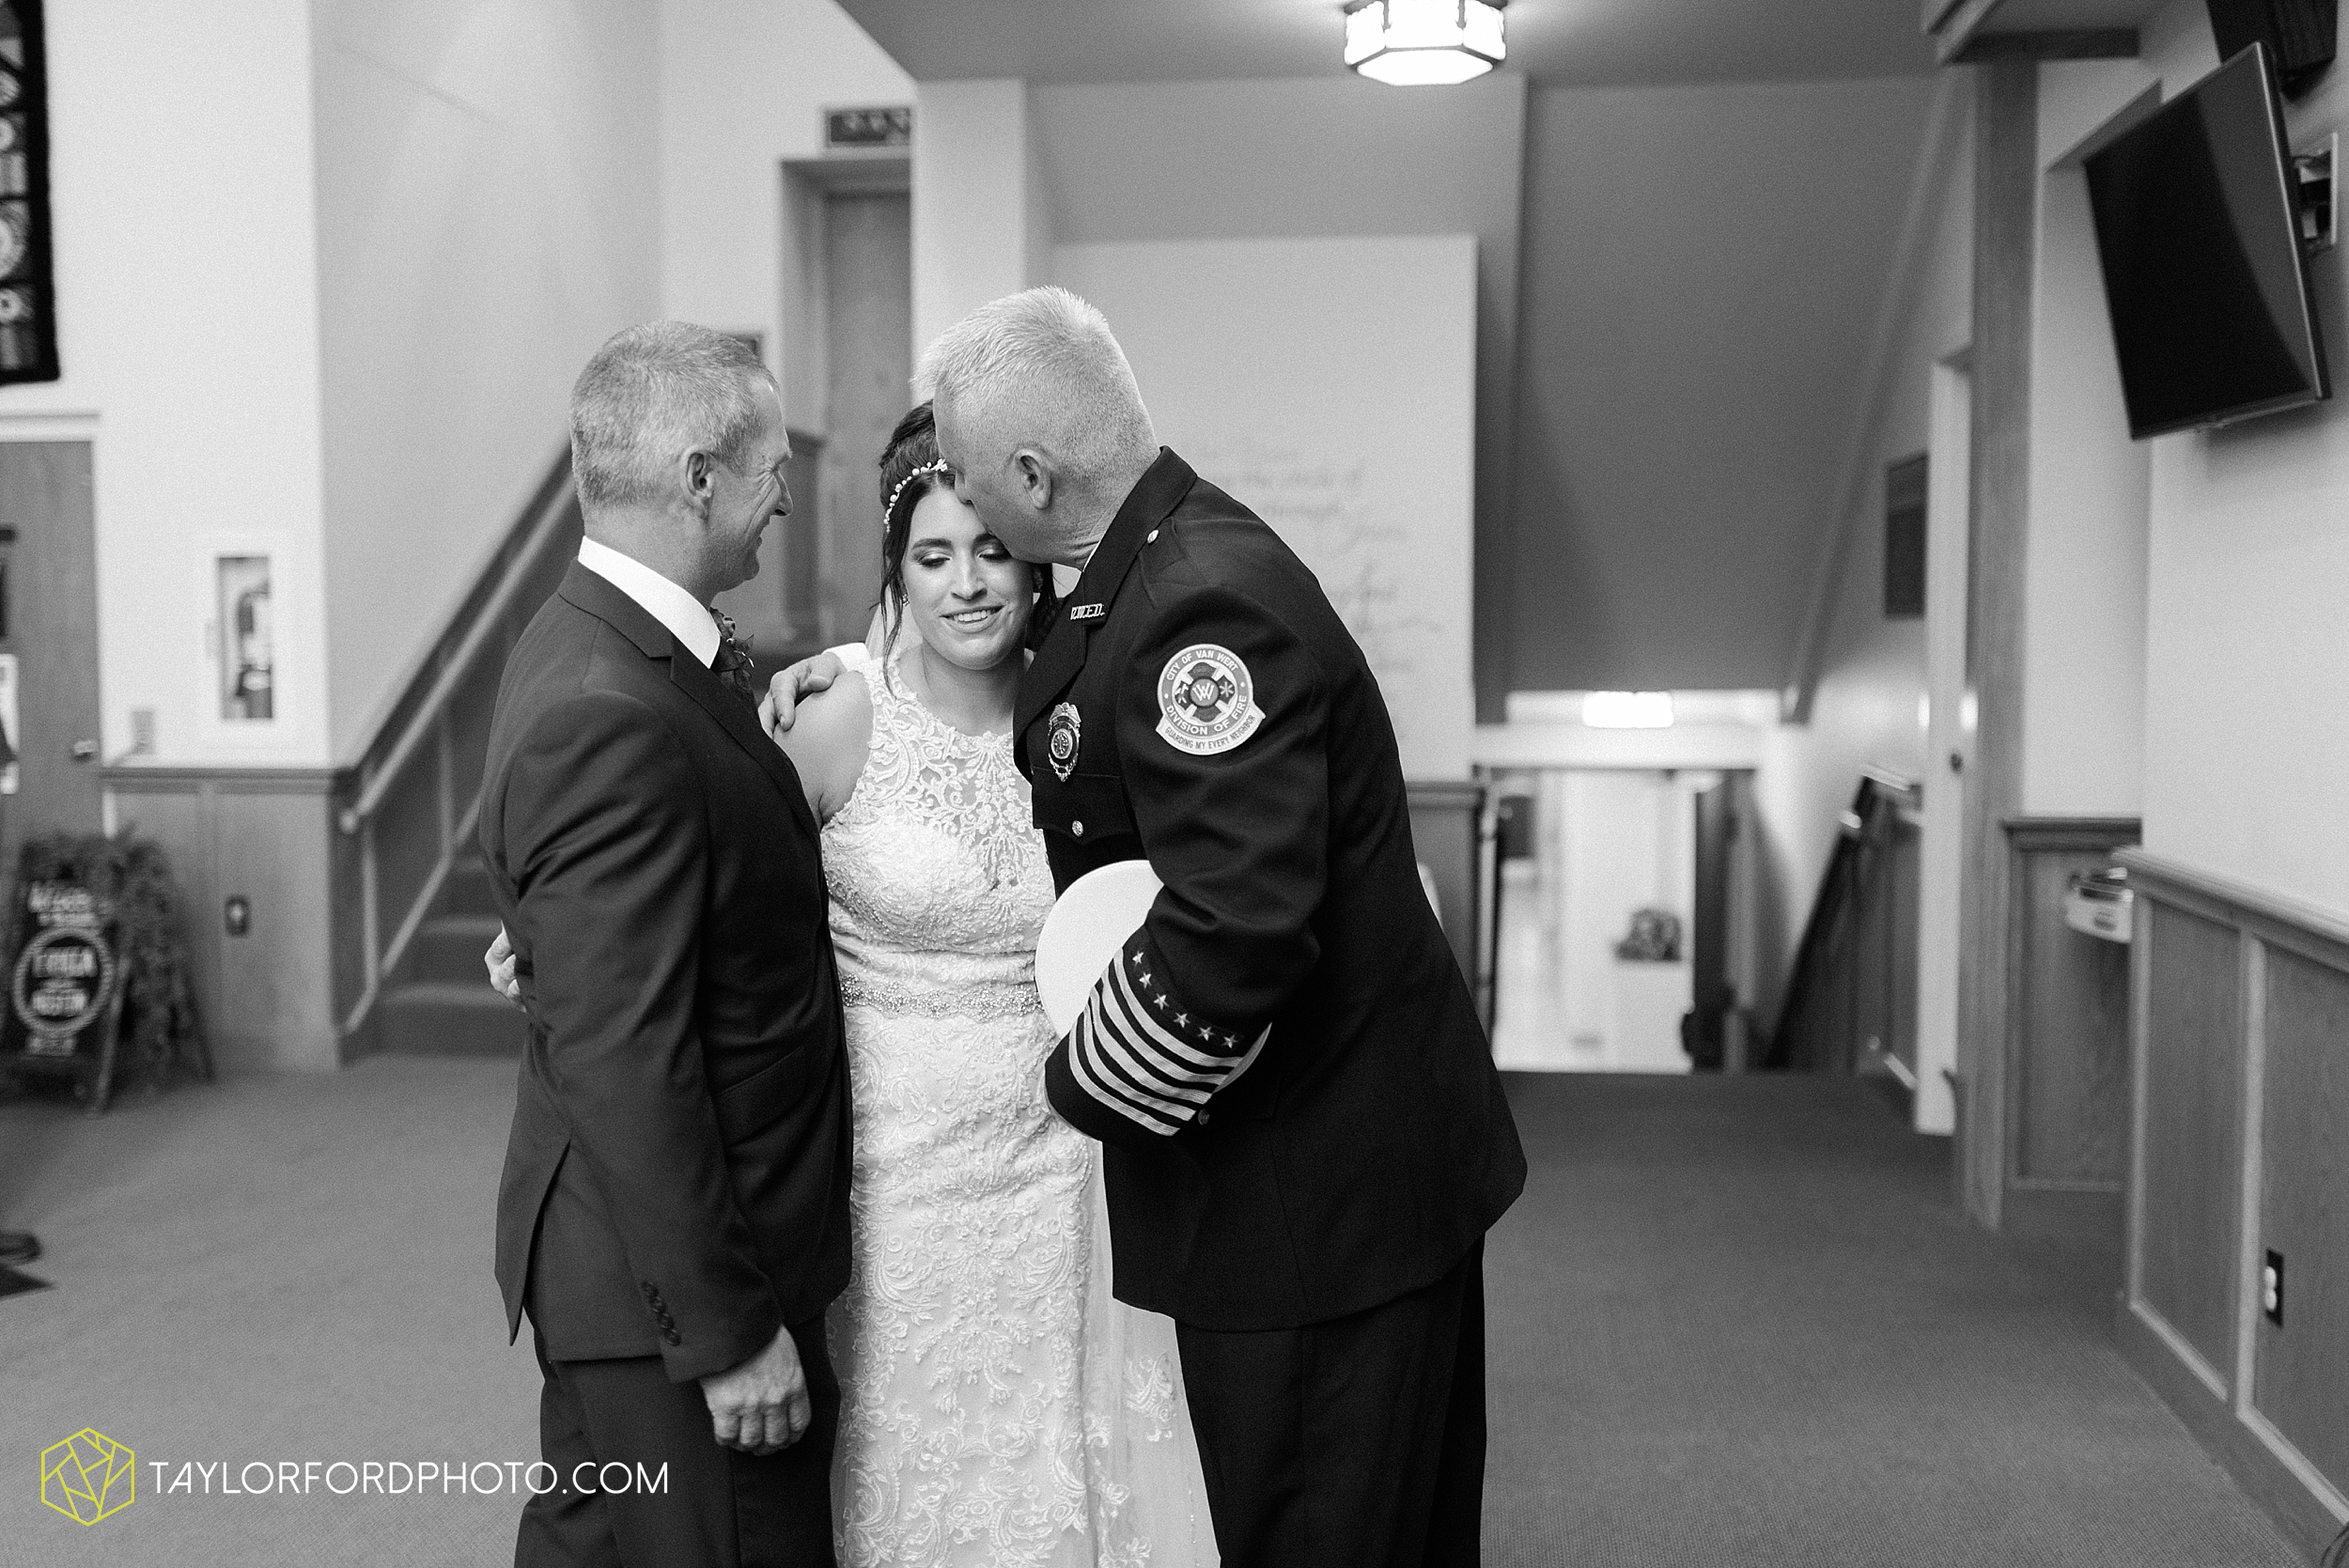 van-wert-ohio-first-united-methodist-church-county-dairy-barn-wedding-photographer-taylor-ford-photography_9823.jpg